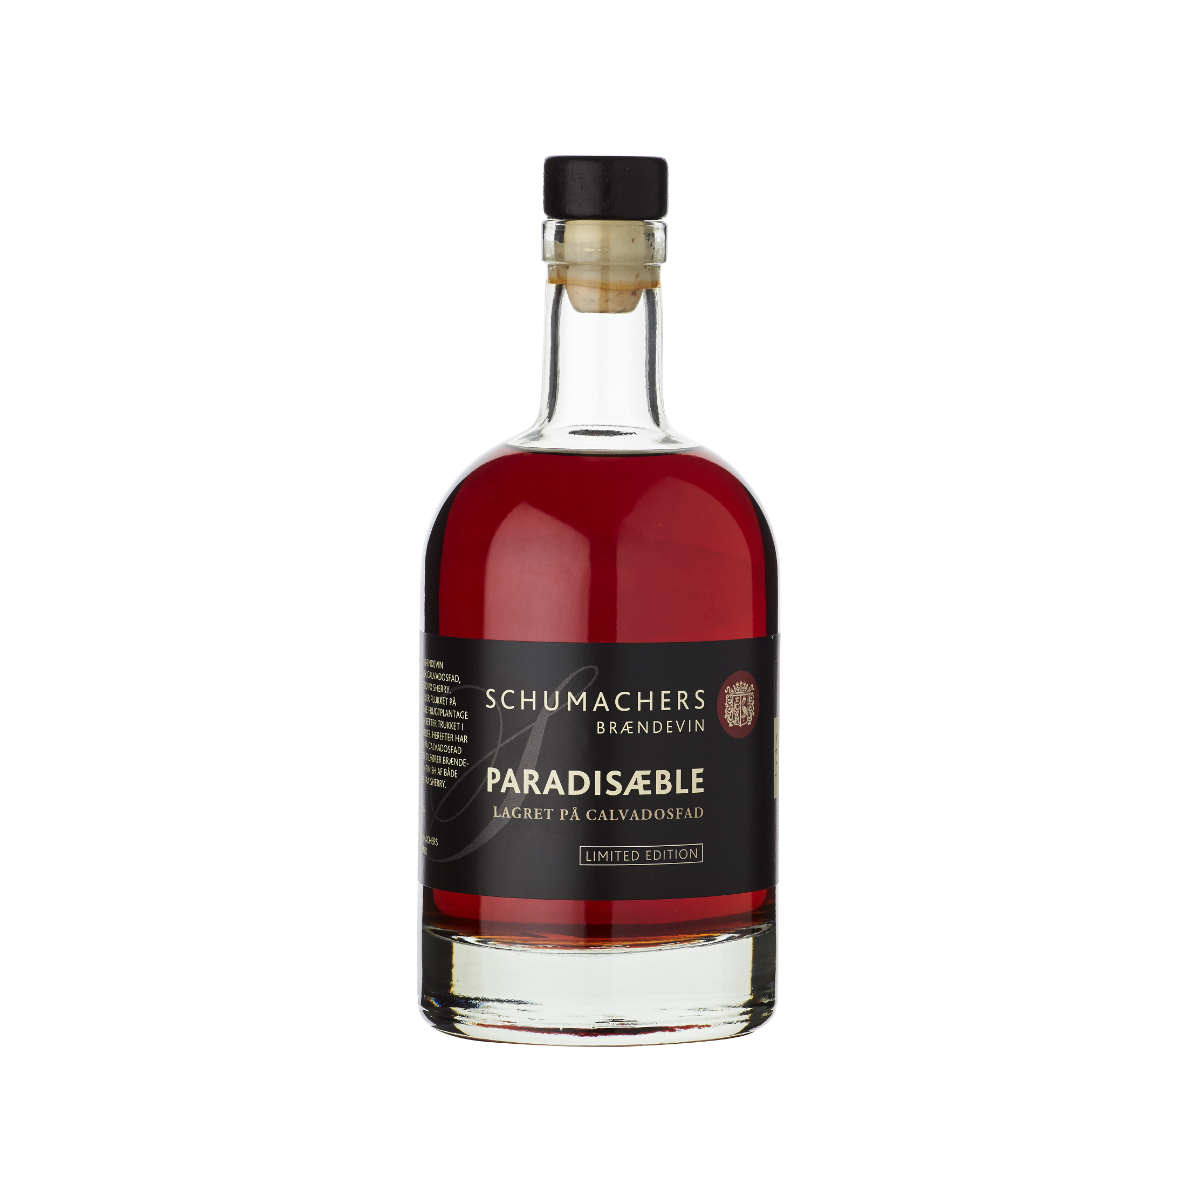 Paradisæble på Calvadosfad